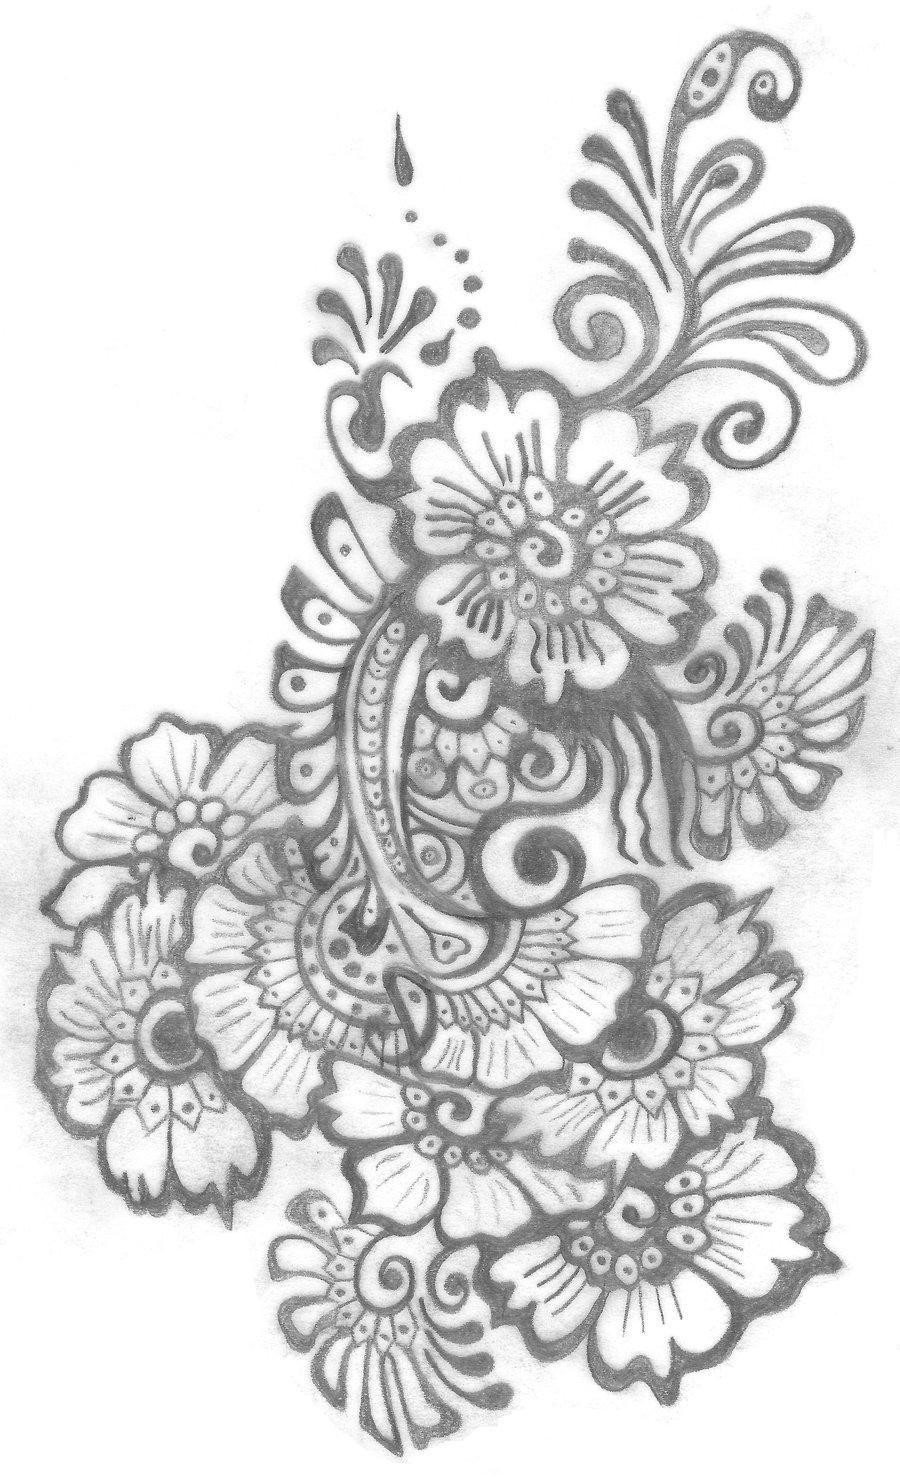 Free Hot Tattoo Designs For Women Images Of Uk Mehndi Sponsored Links Latest Hot Tattoo Design Wallpaper Henna Designs Henna Patterns Henna Drawings